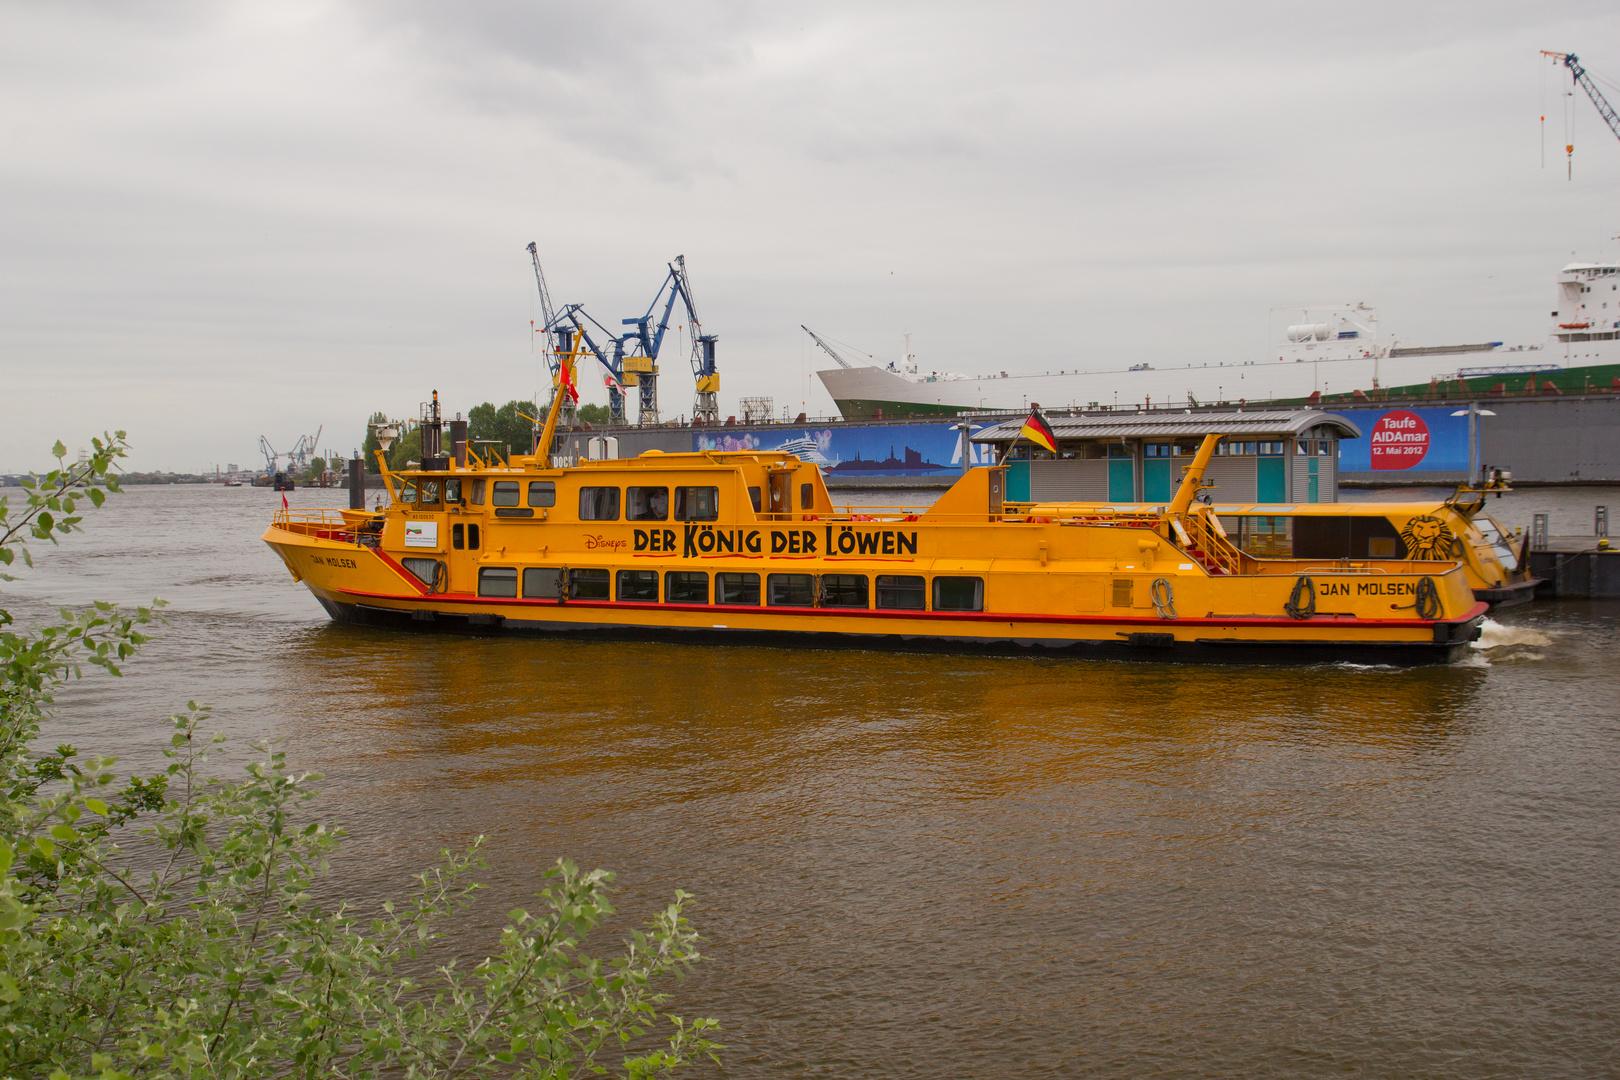 Hamburg Impressionen - Hamburger Hafen (37)